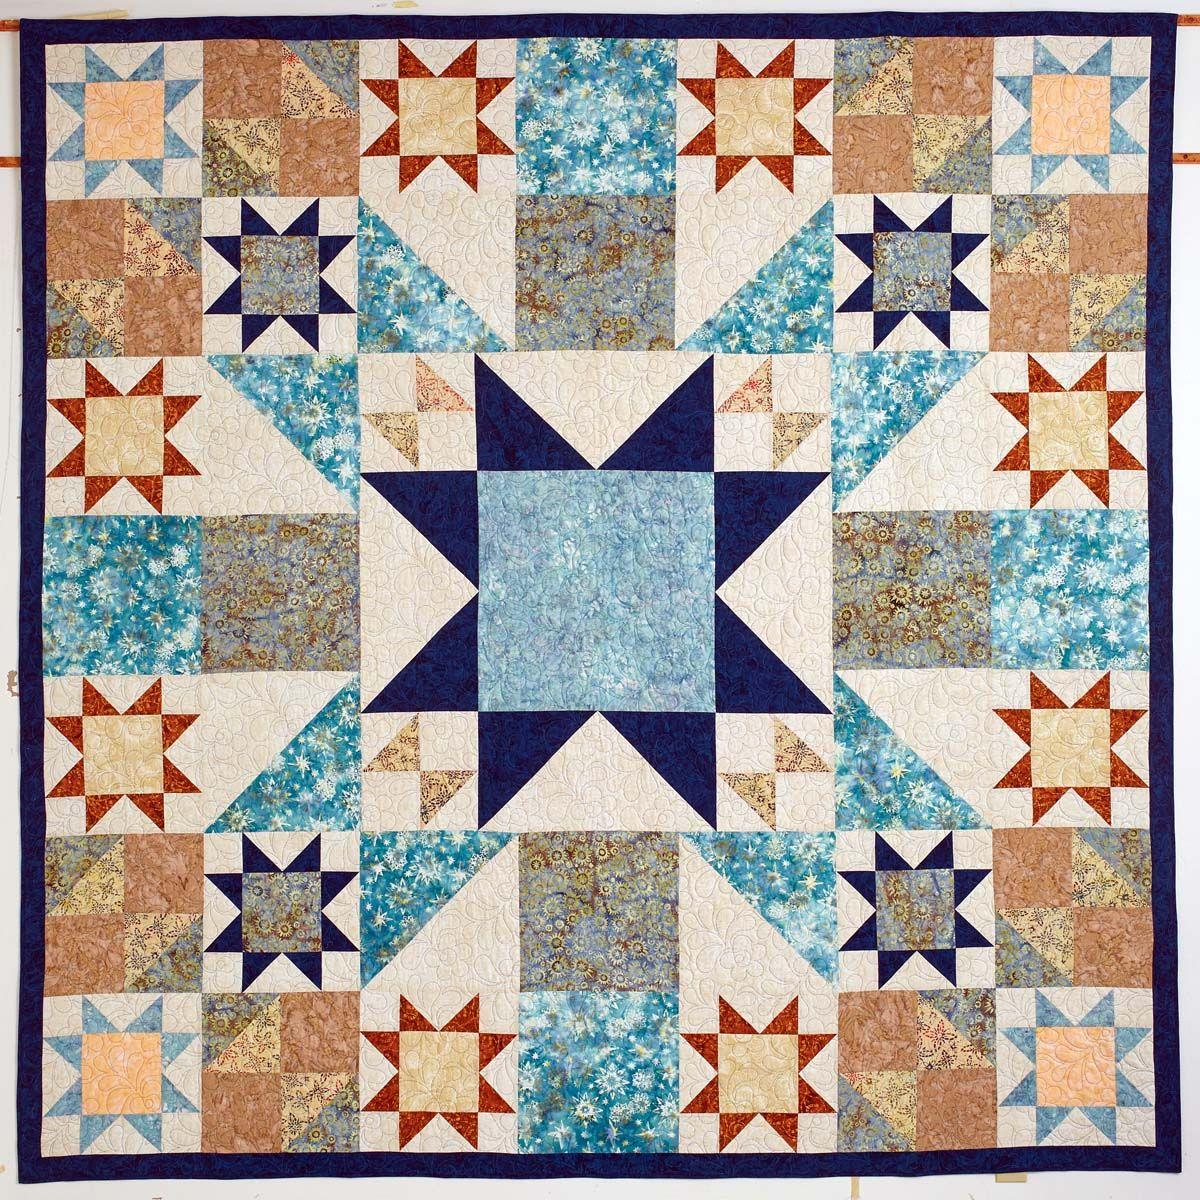 Big Sky Country Quilts Big Block Quilts Sampler Quilts